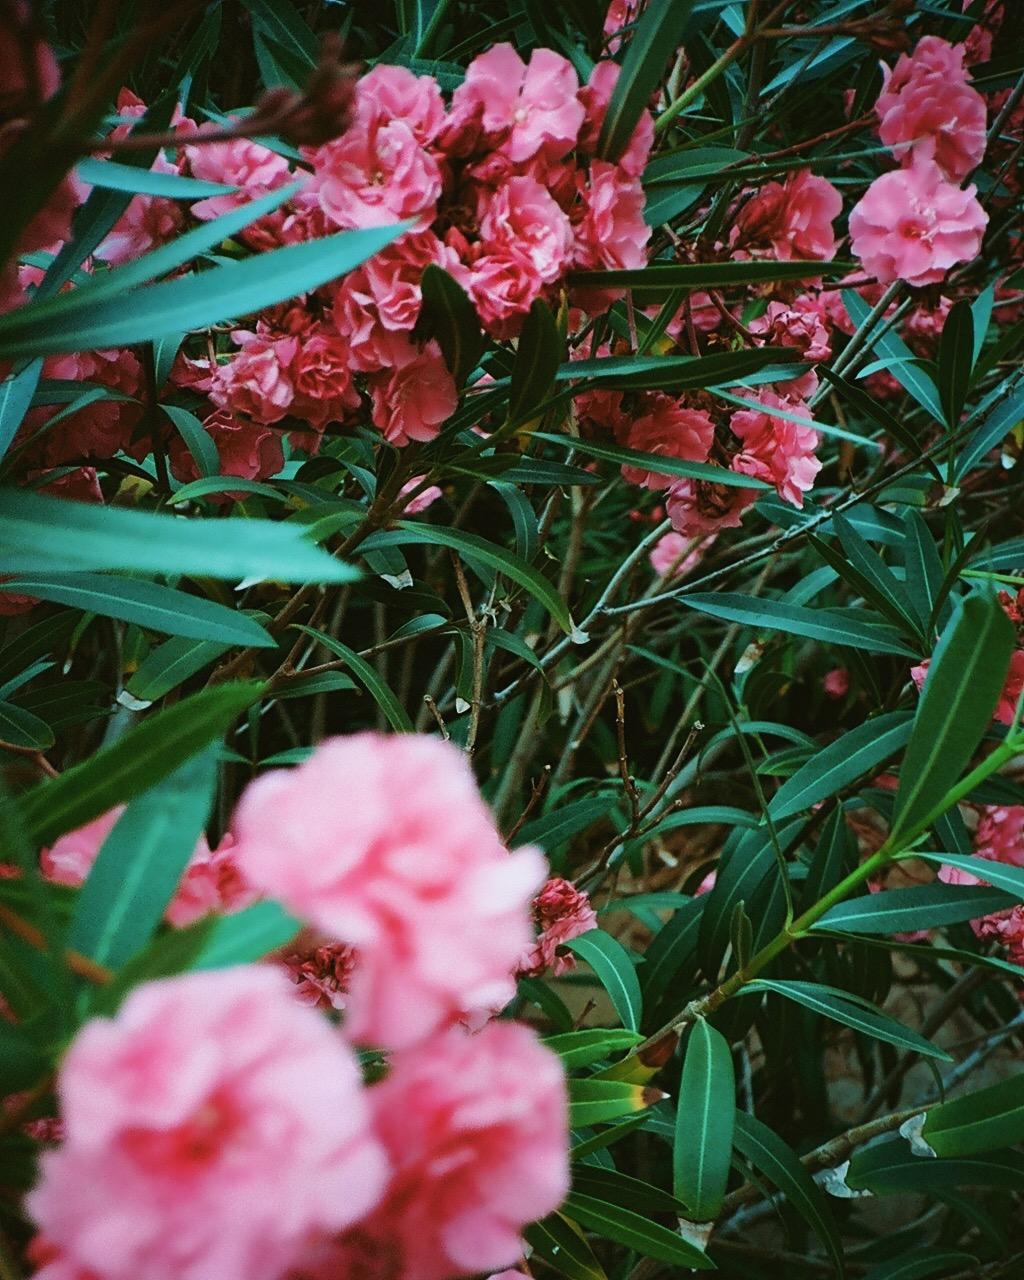 Flowers in Costa Brava